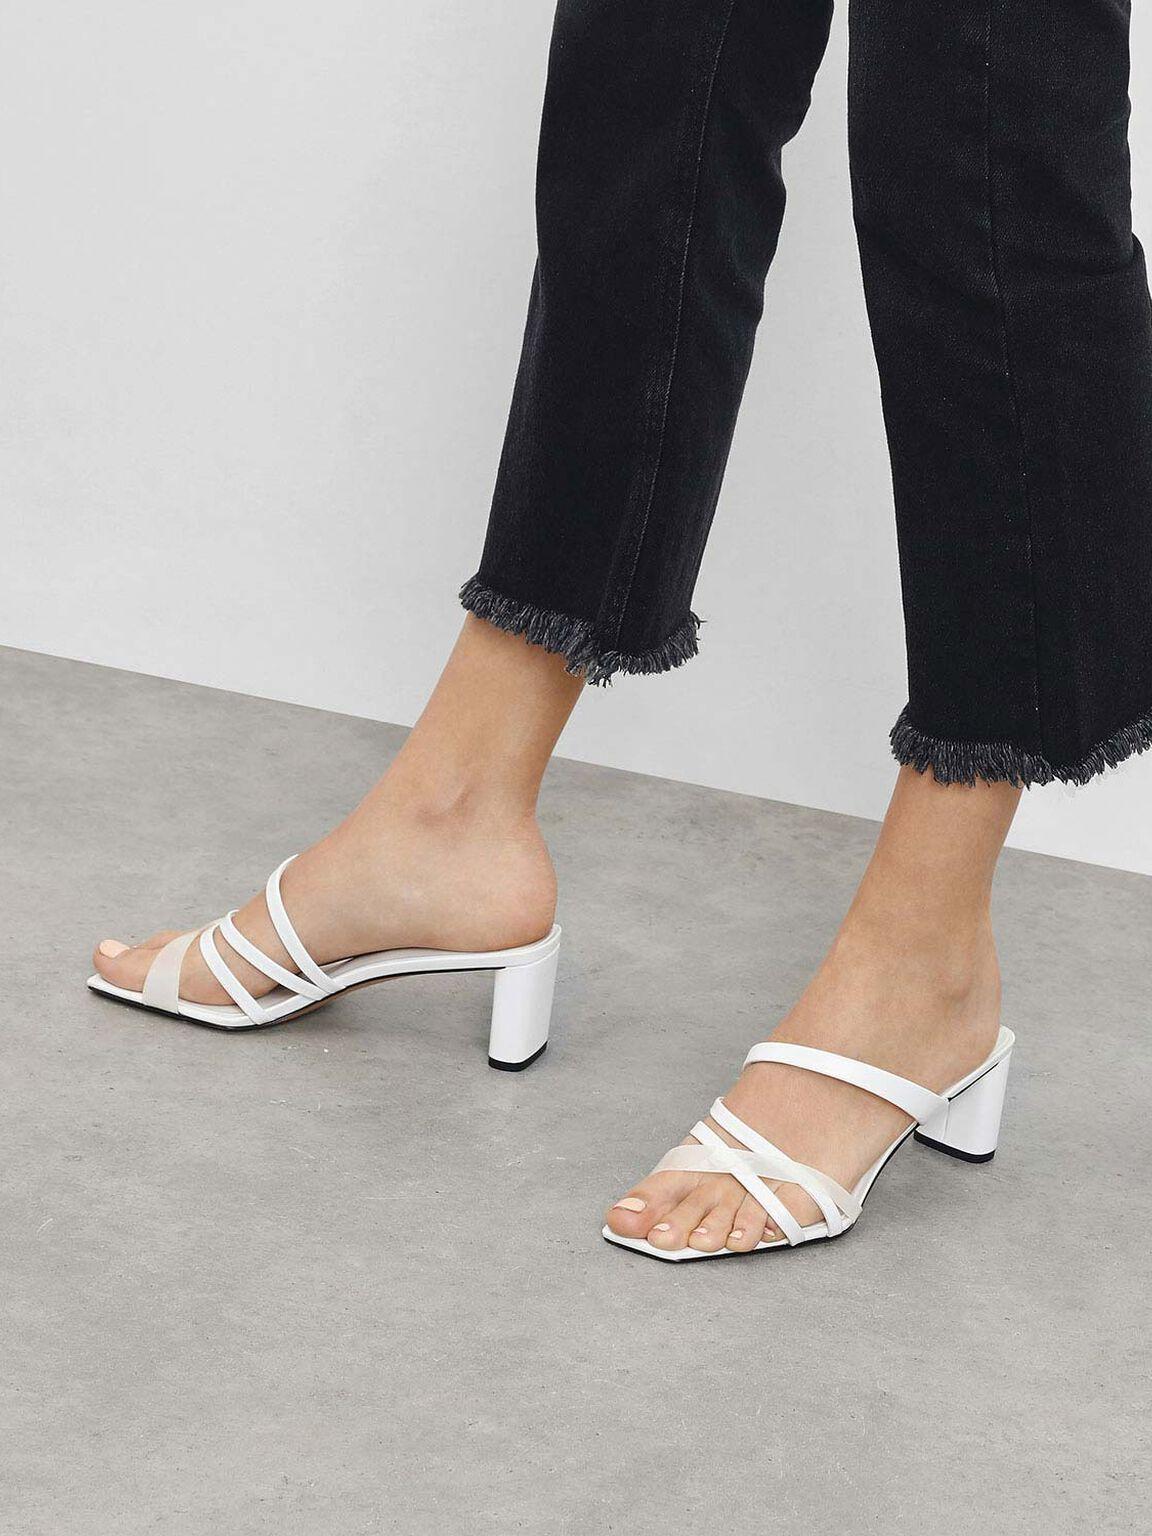 Strappy Slide Sandals, White, hi-res